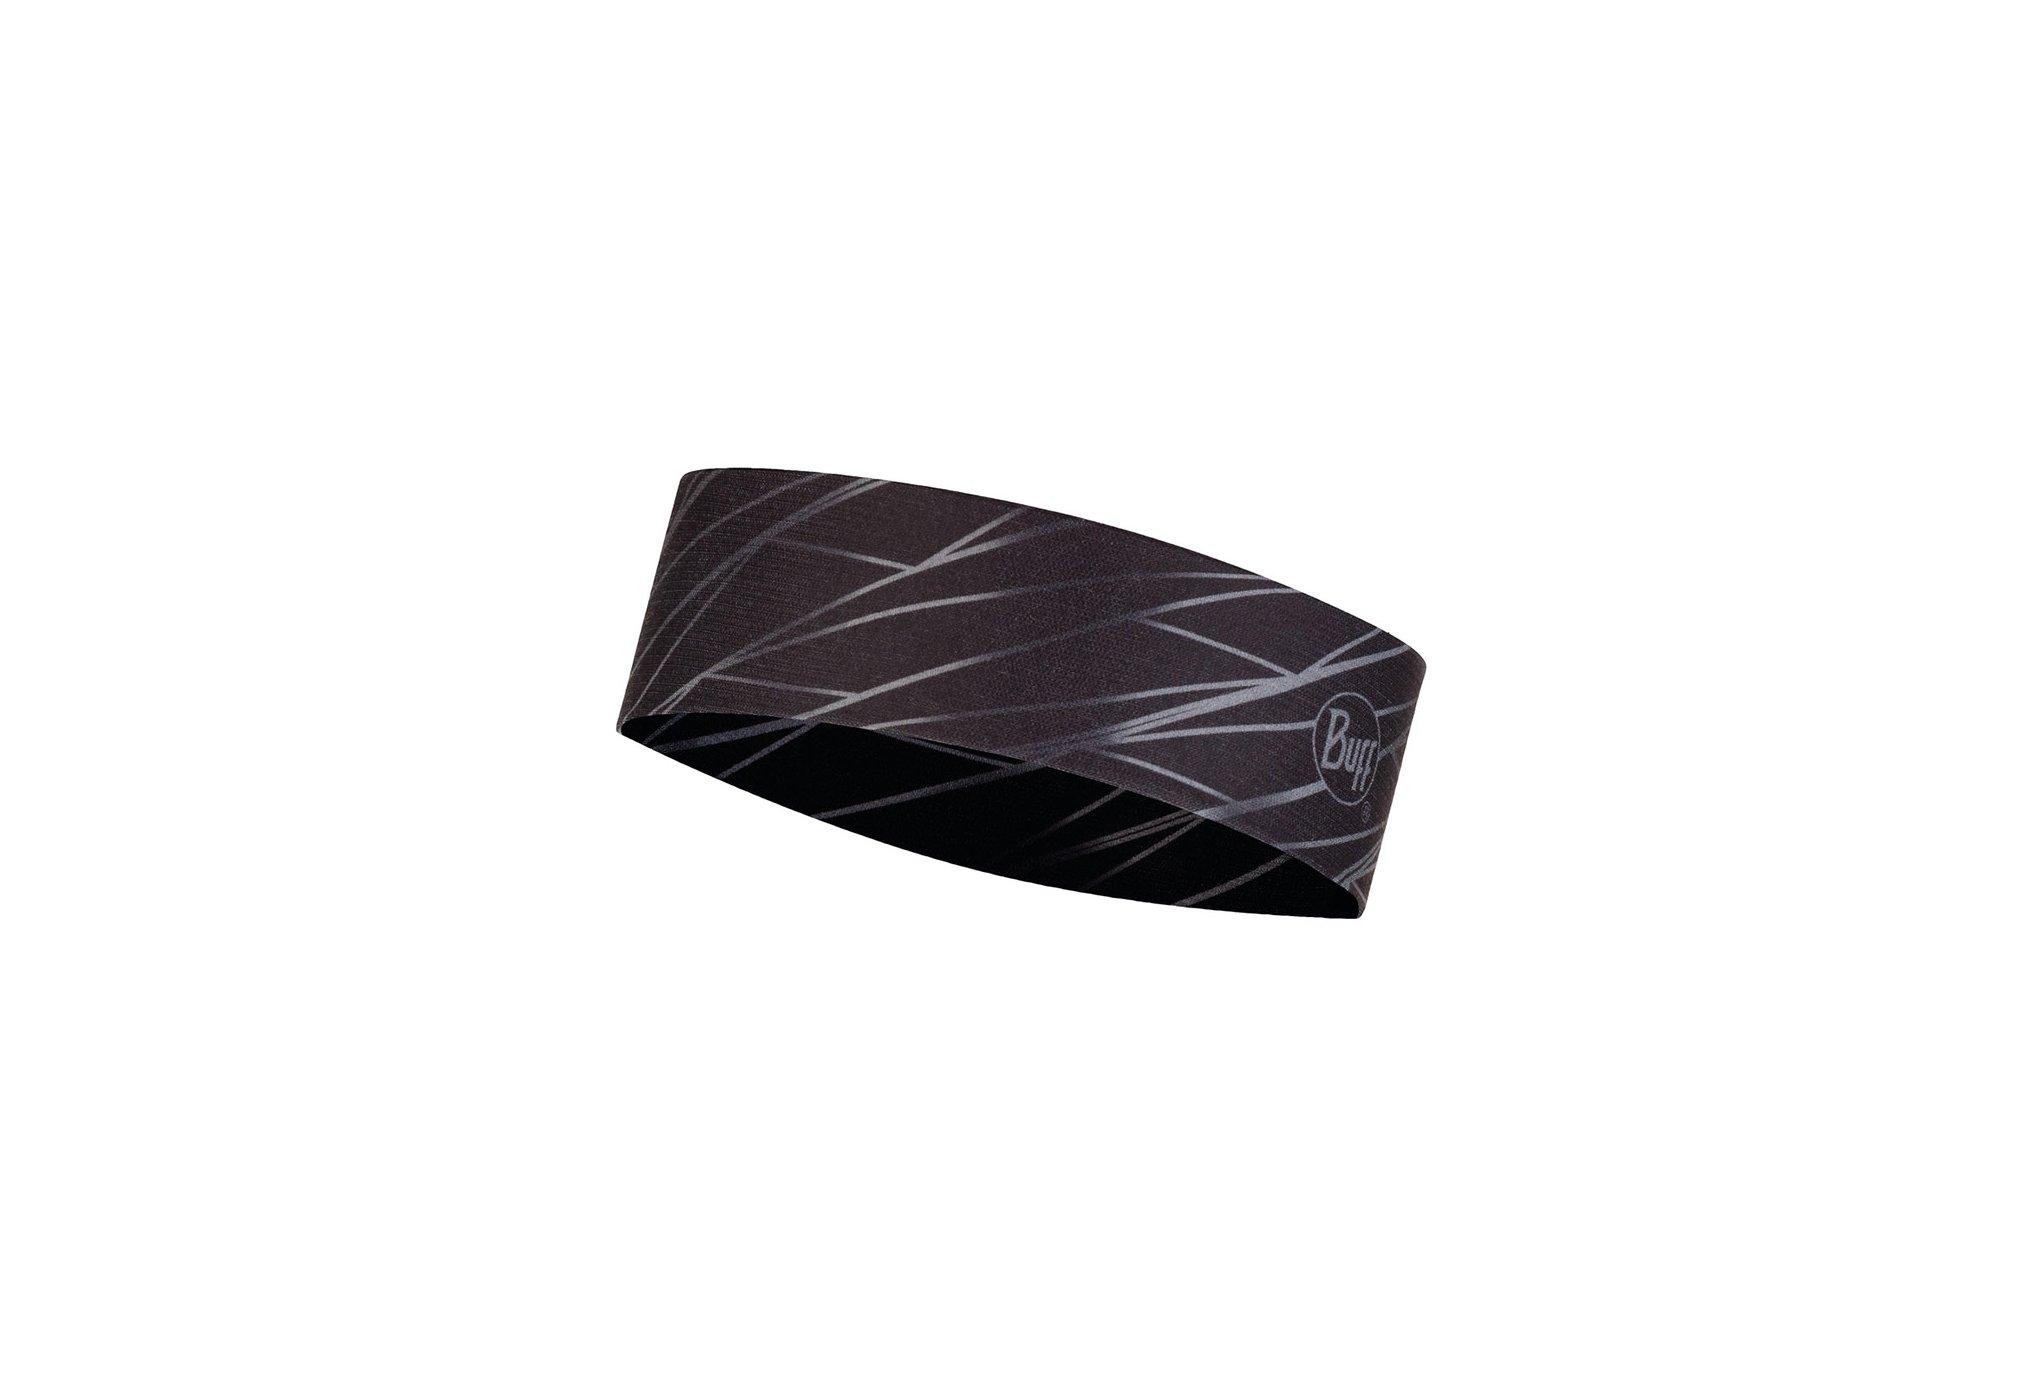 Buff Coolnet UV+ Slim Headband Boost Graphite Casquettes / bandeaux